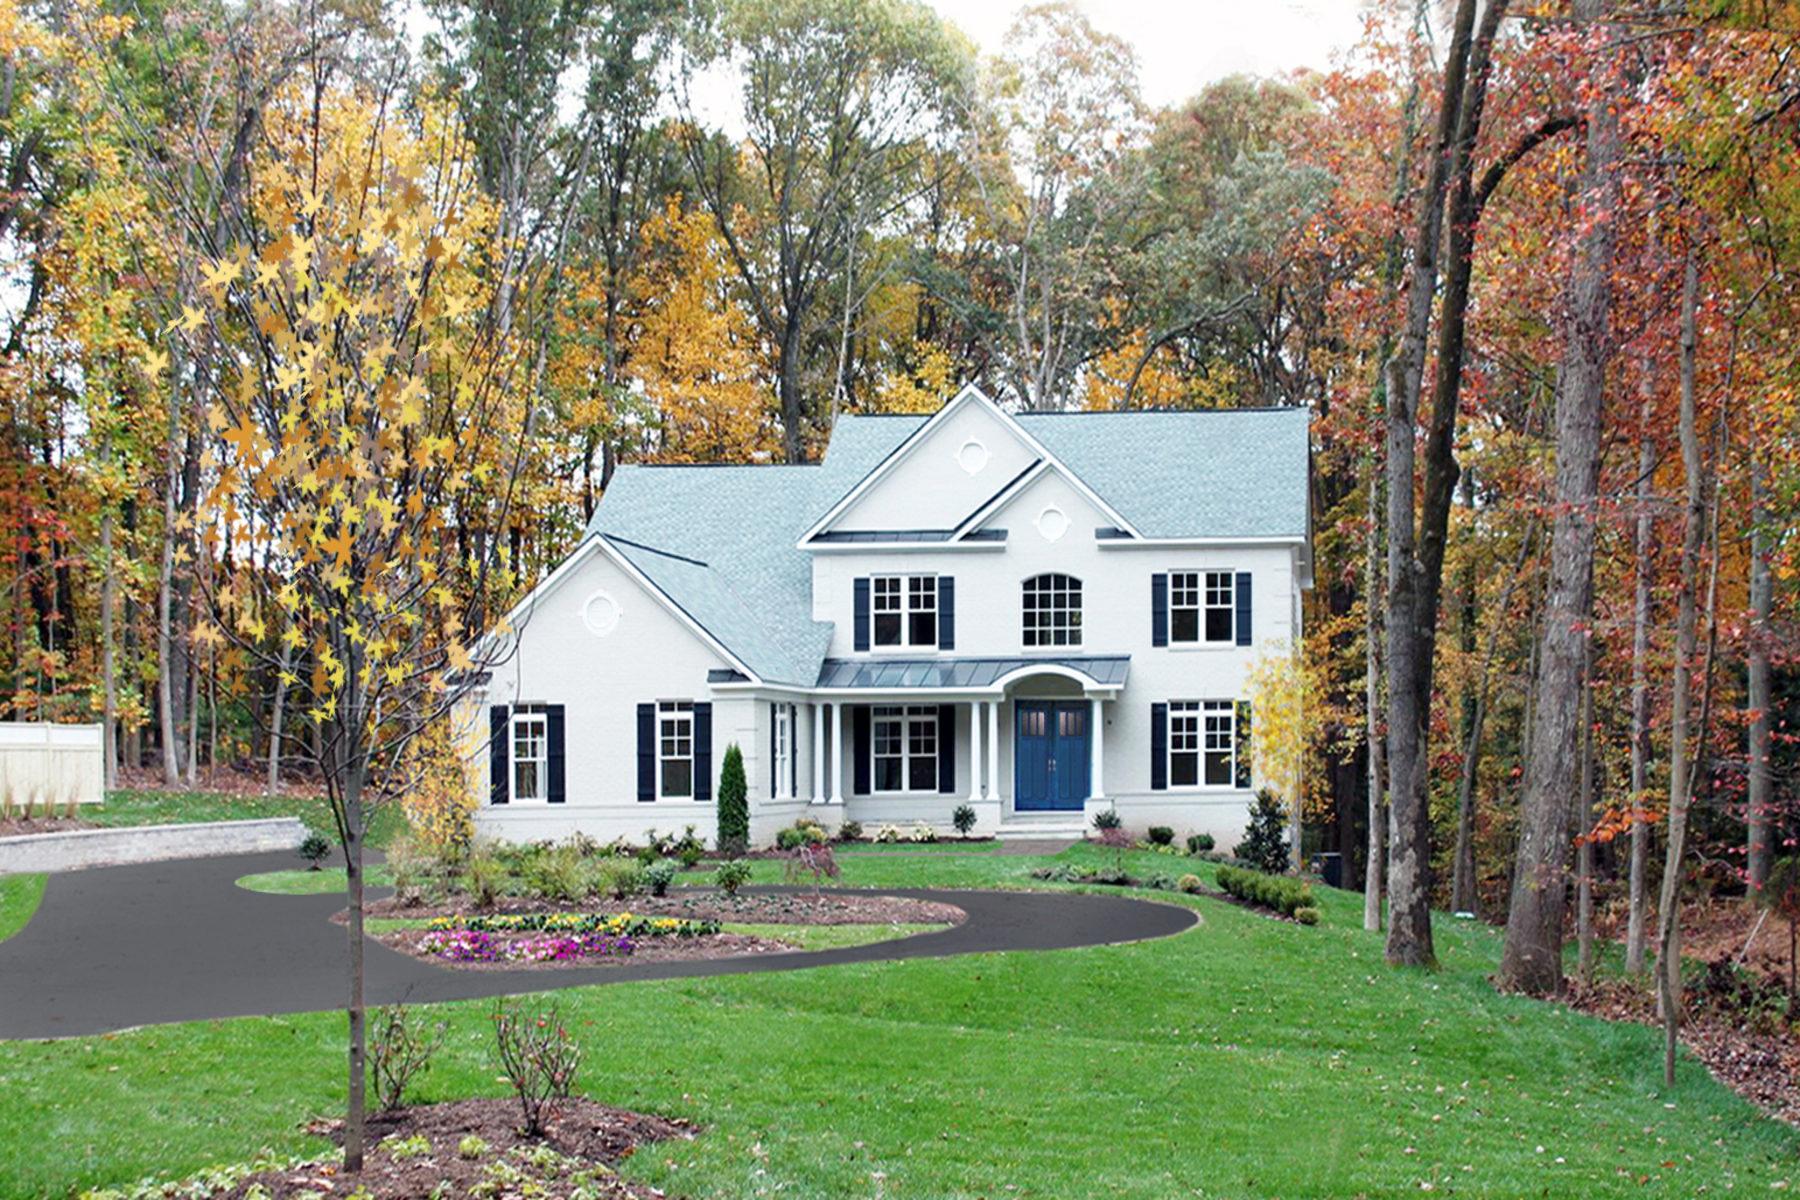 Property For Sale at 3717 Linda Lane, Annandale